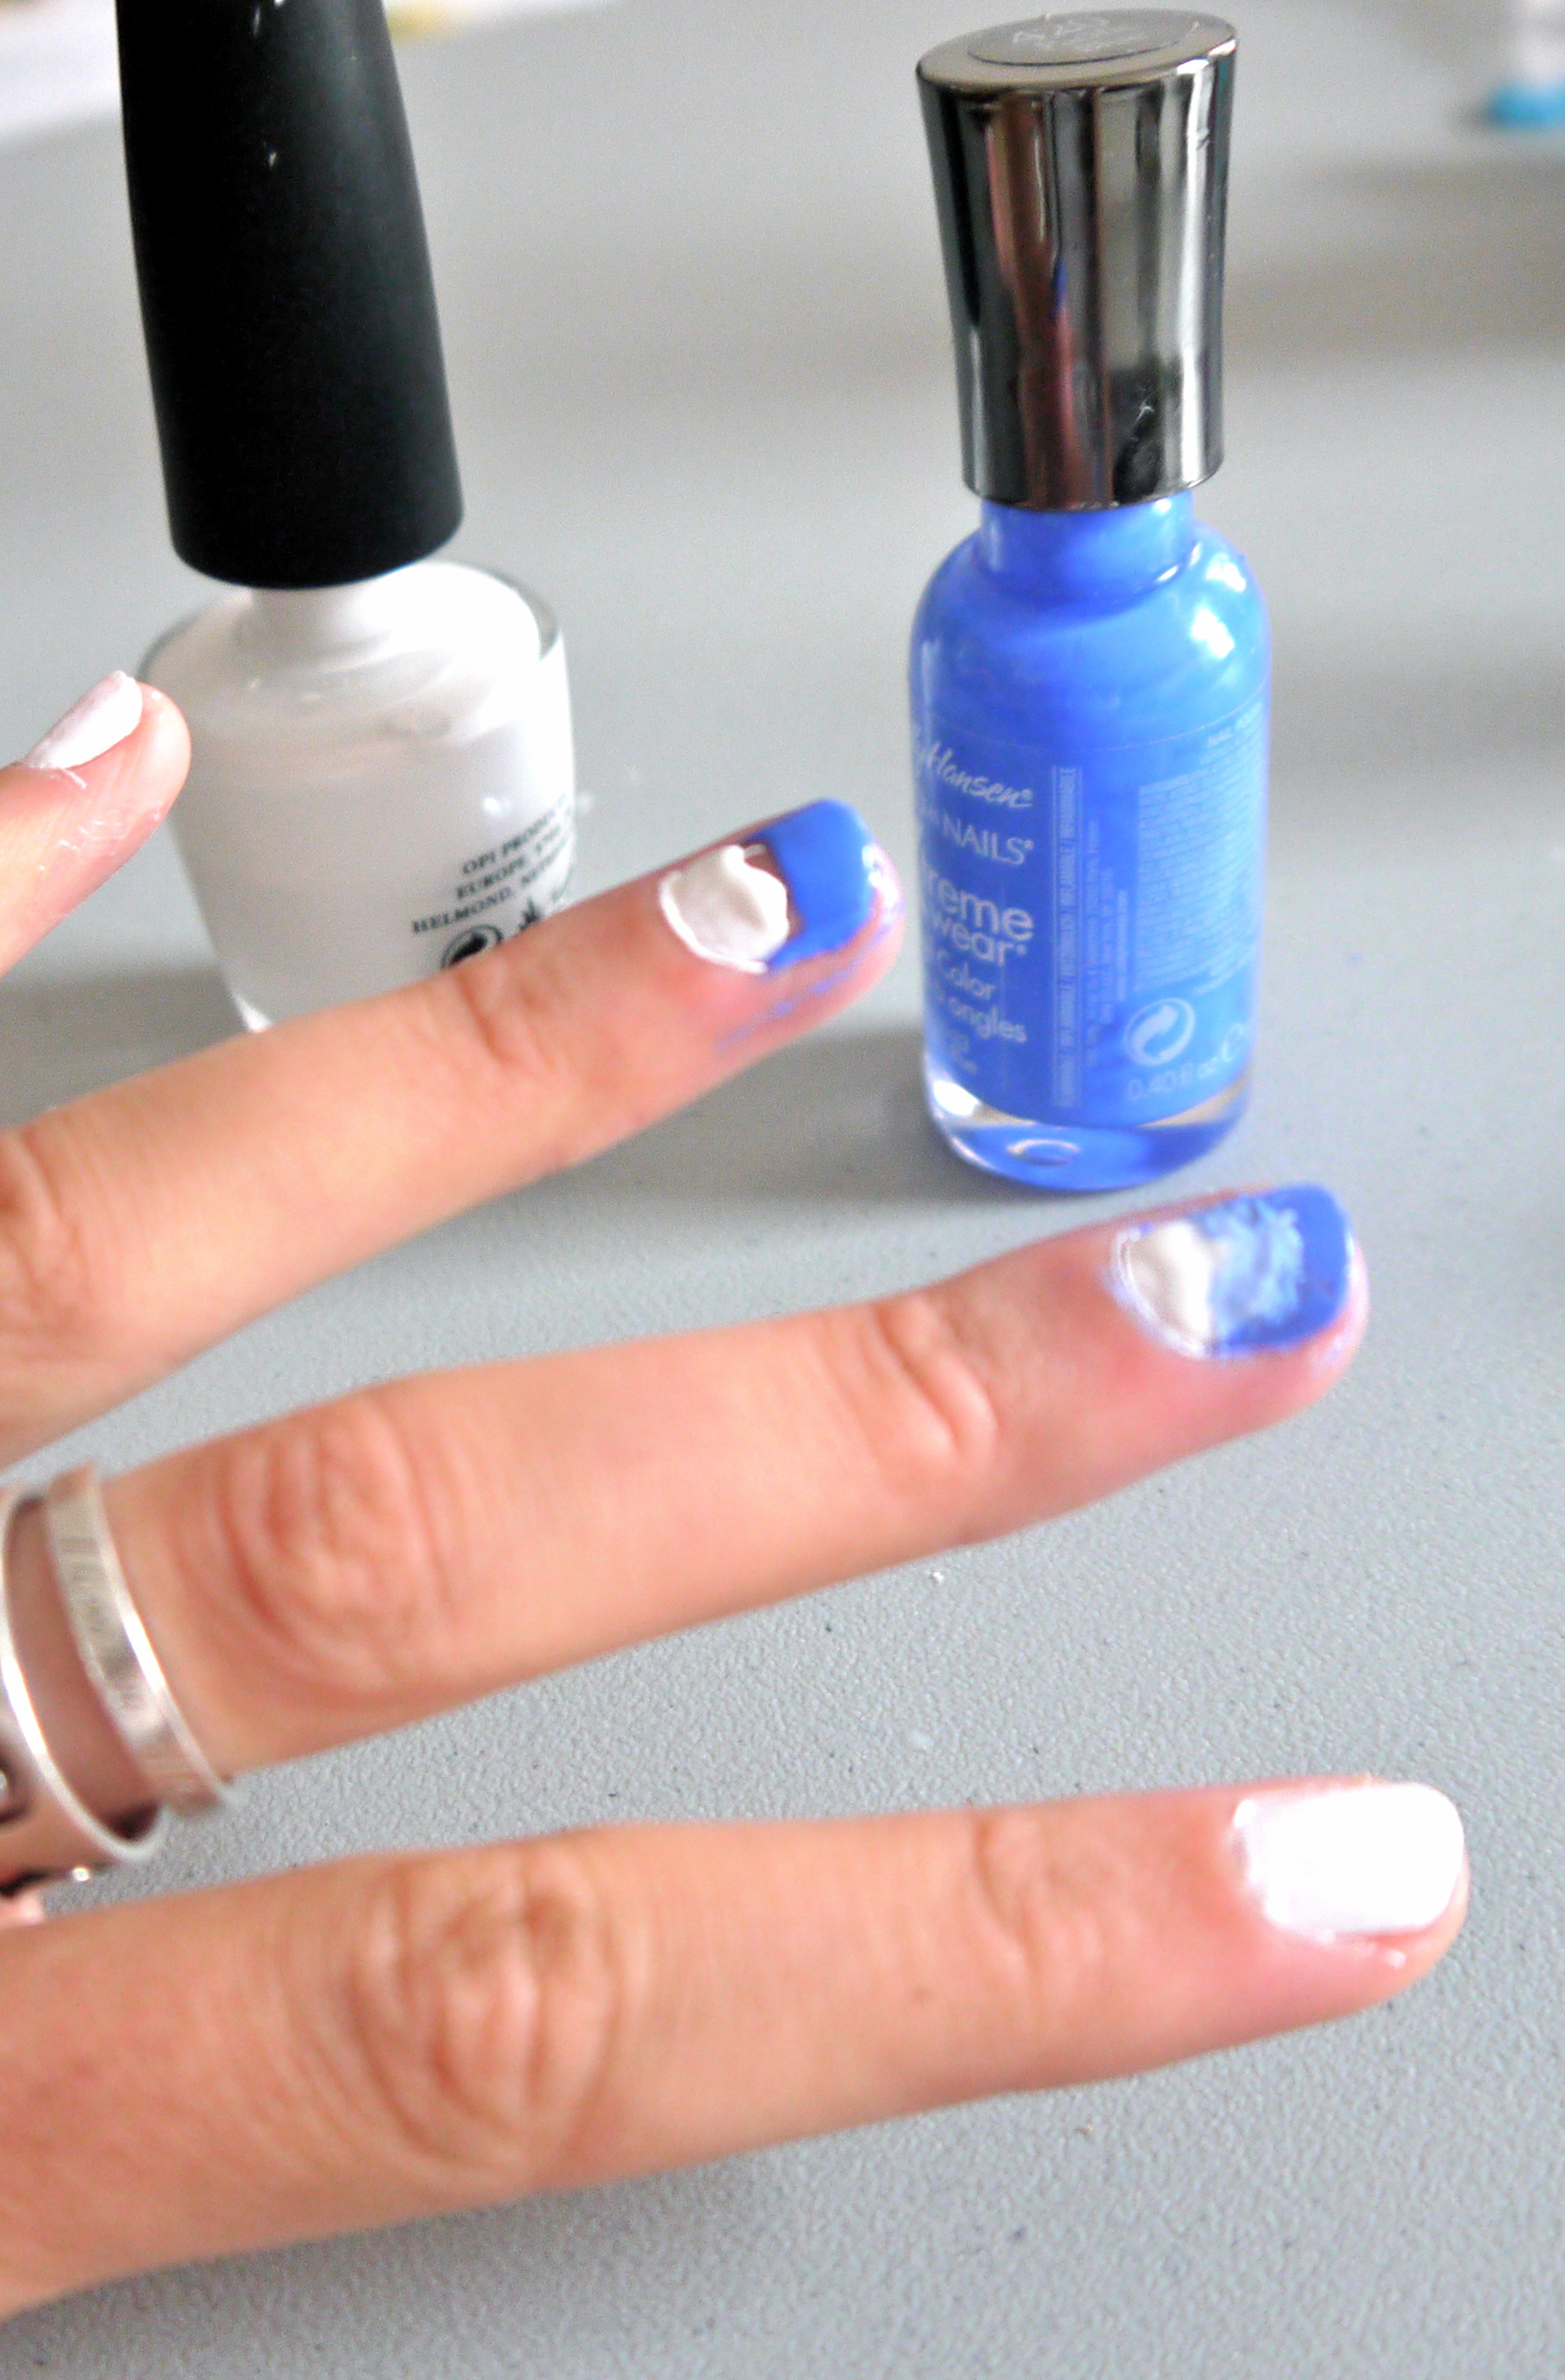 Diy ombre nail polish pumps iron using solutioingenieria Choice Image